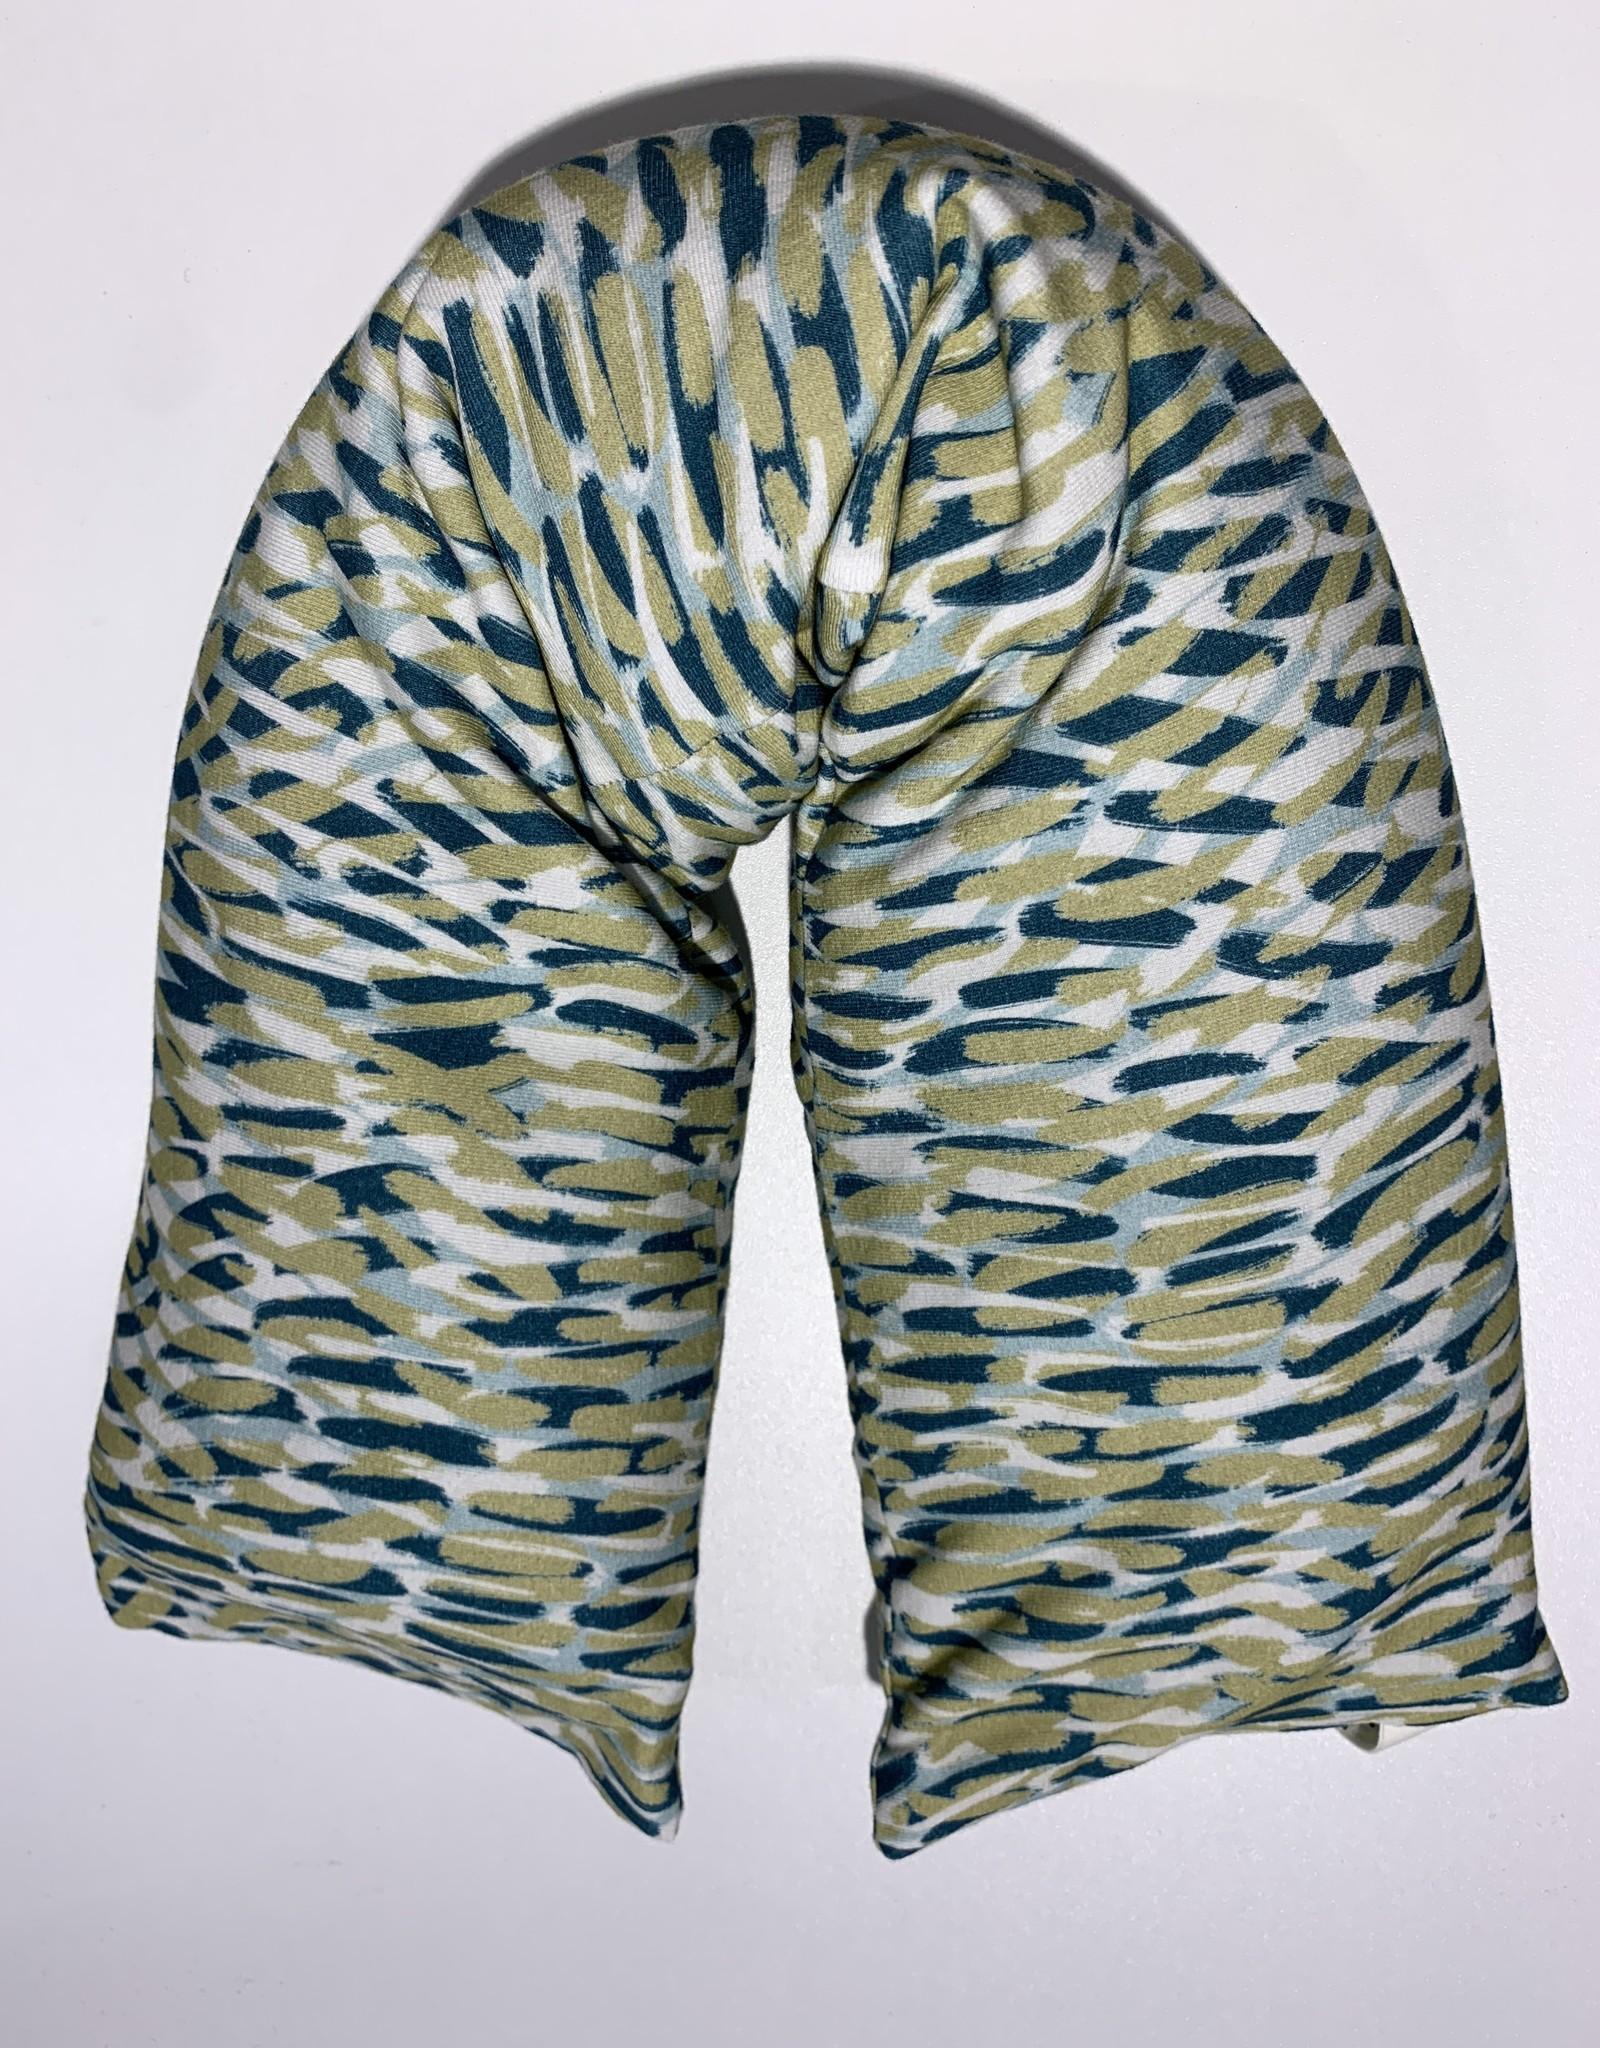 Nackenrolle Wuzi grün Muster waschbar 95% Bio Baumwolle 5% Elasthan